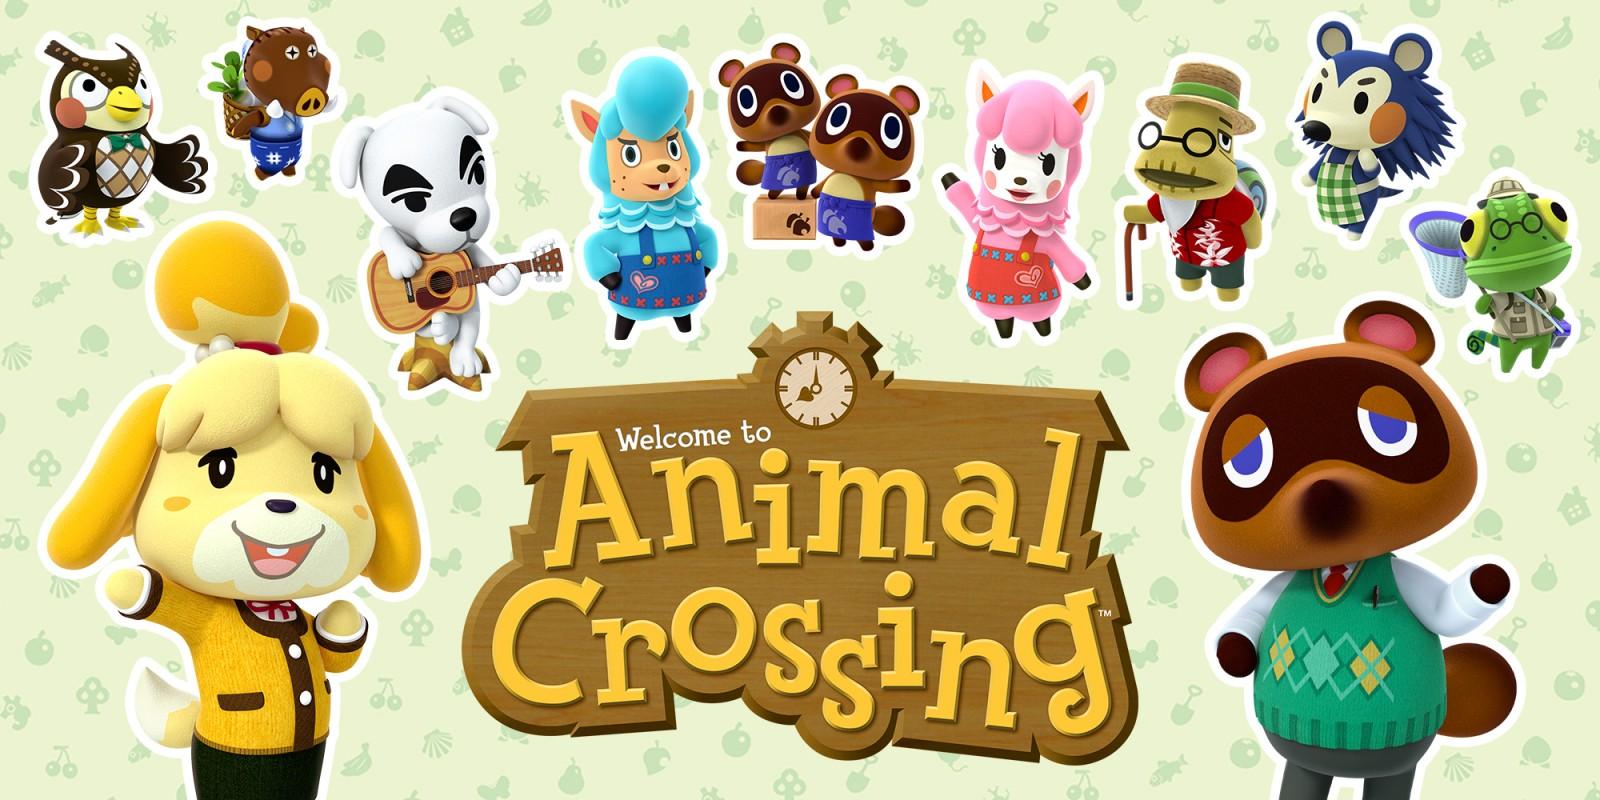 Трансляция Animal Crossing Direct